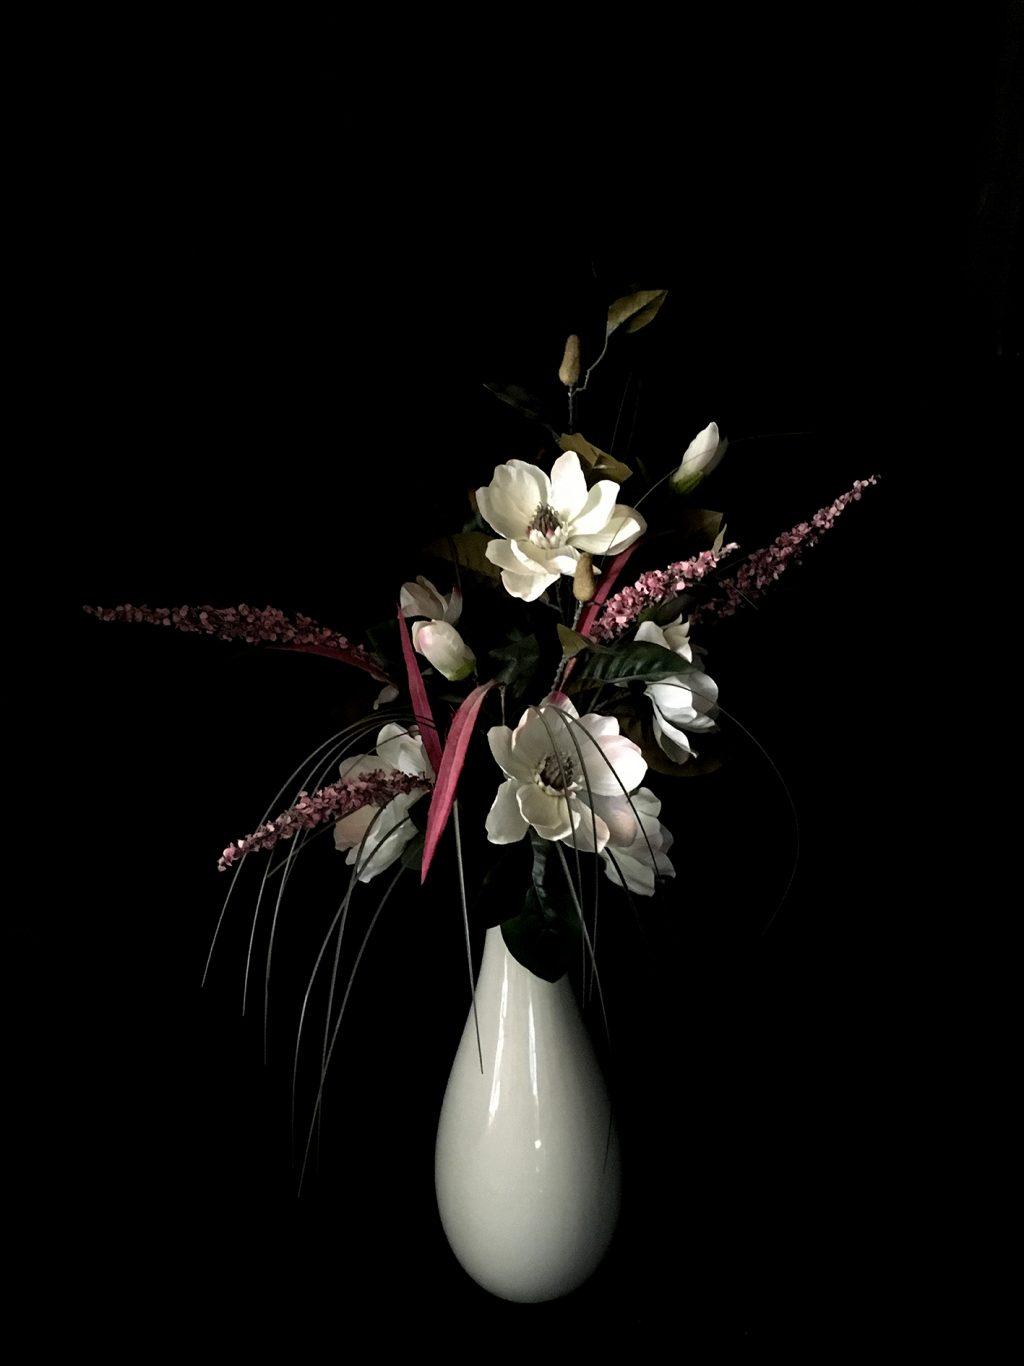 Dawn Cole_Magnolia in white vase_LR at Pie Factory Margate